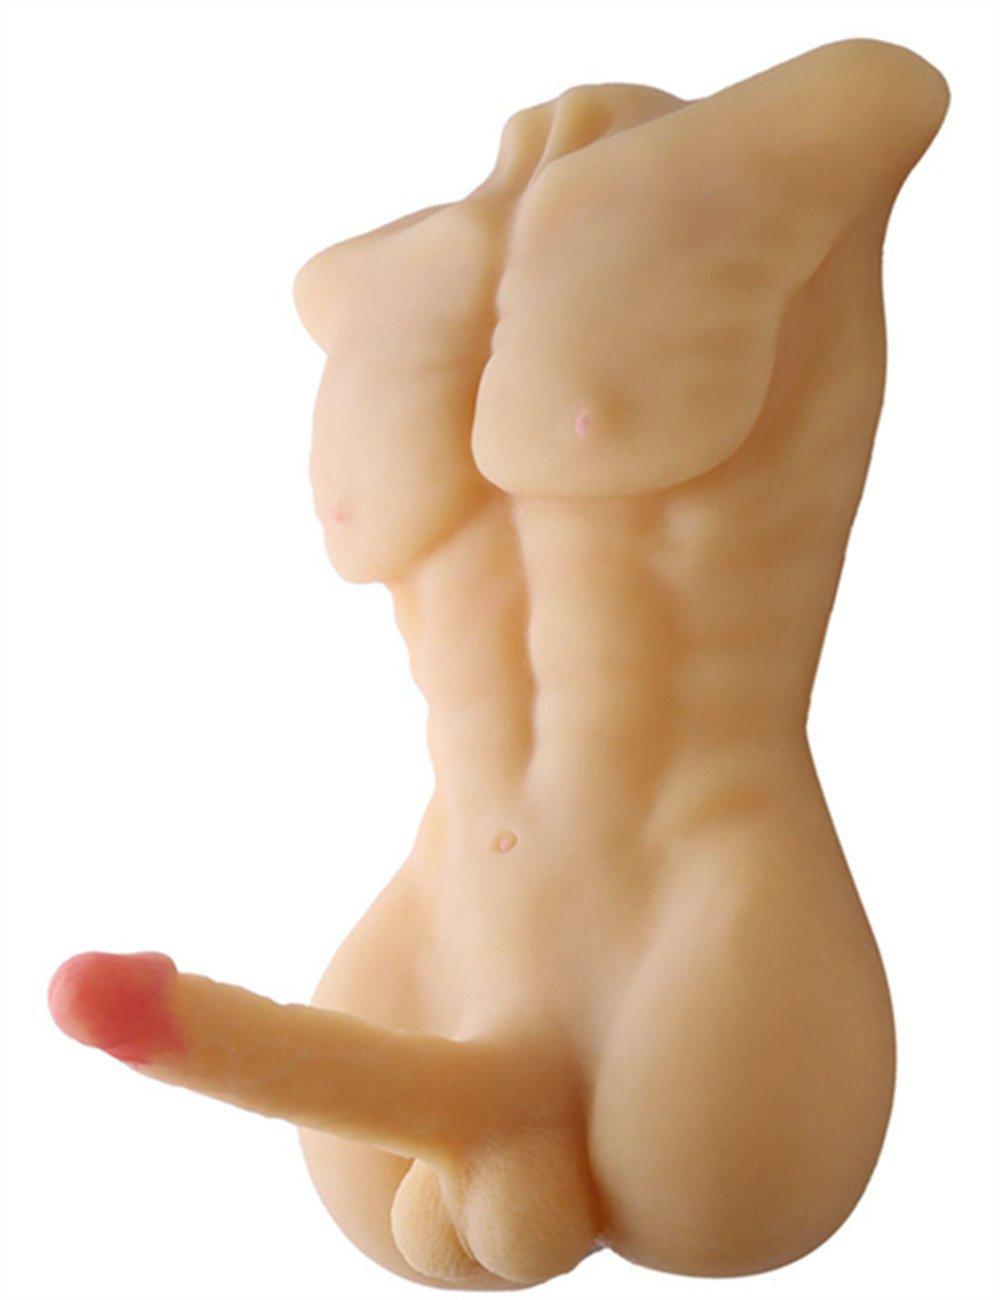 Love Doll Torso Male Body ,SINLOLI 3D Realistic Sex Toy Doll with Big Realistic Dildo for Women (Flesh) by SINLOLI